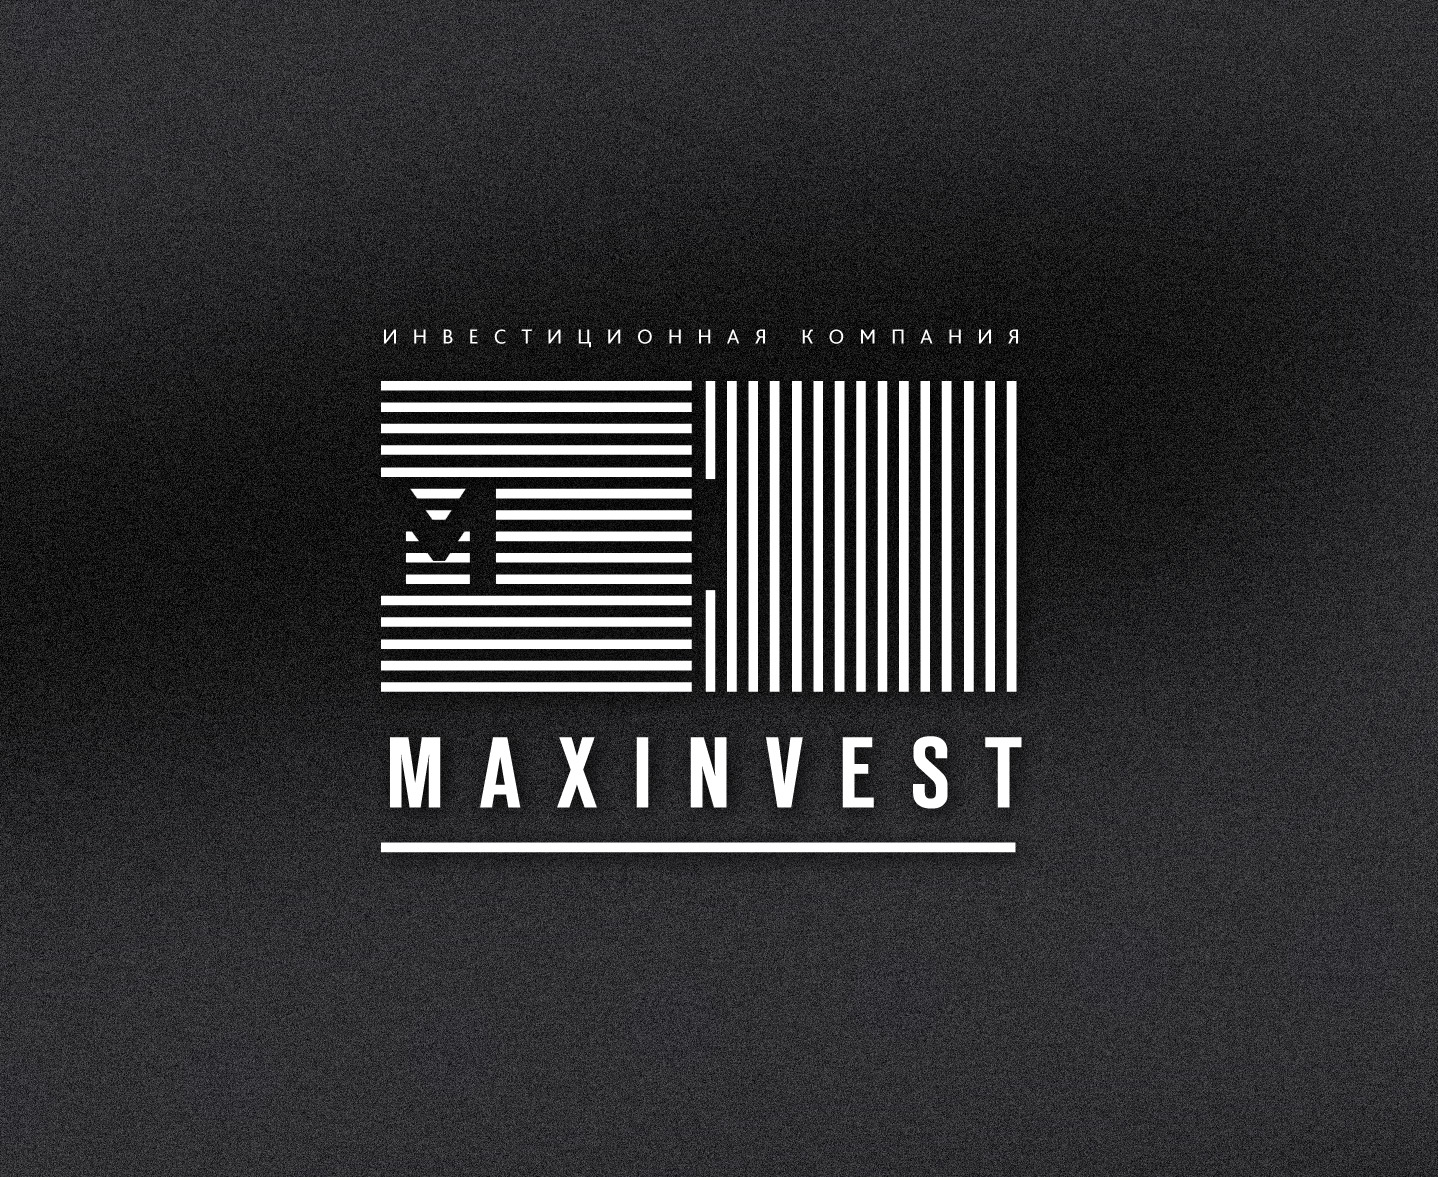 Логотип, фирменный шрифт, фирменный бланк фото f_4515acf94e56ab14.jpg